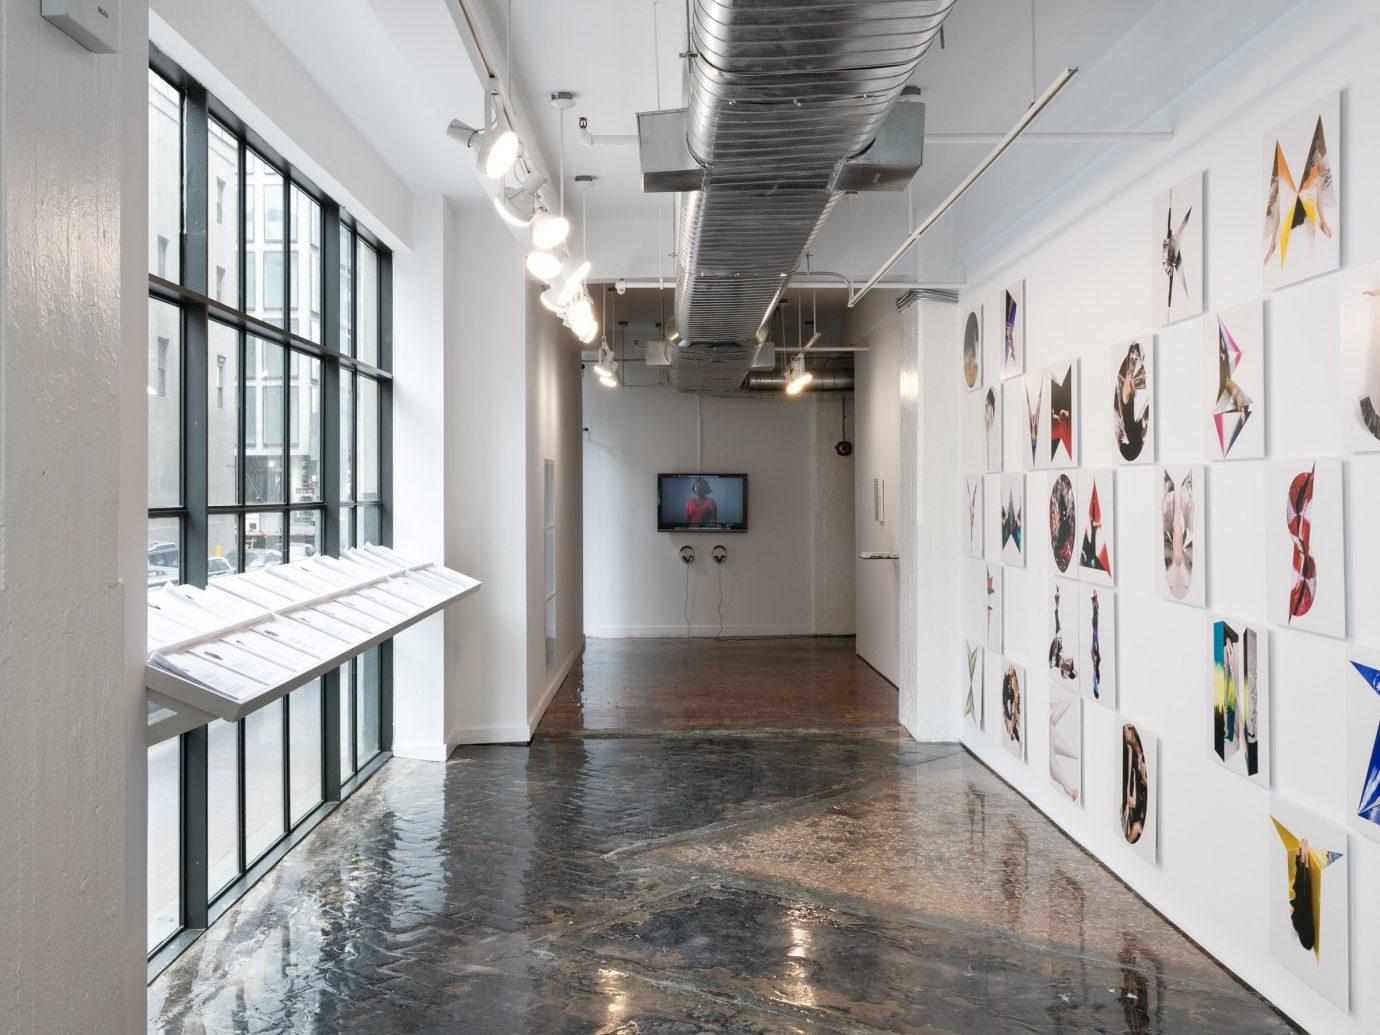 Trip Ideas indoor exhibition interior design floor flooring art gallery art exhibition hall loft several